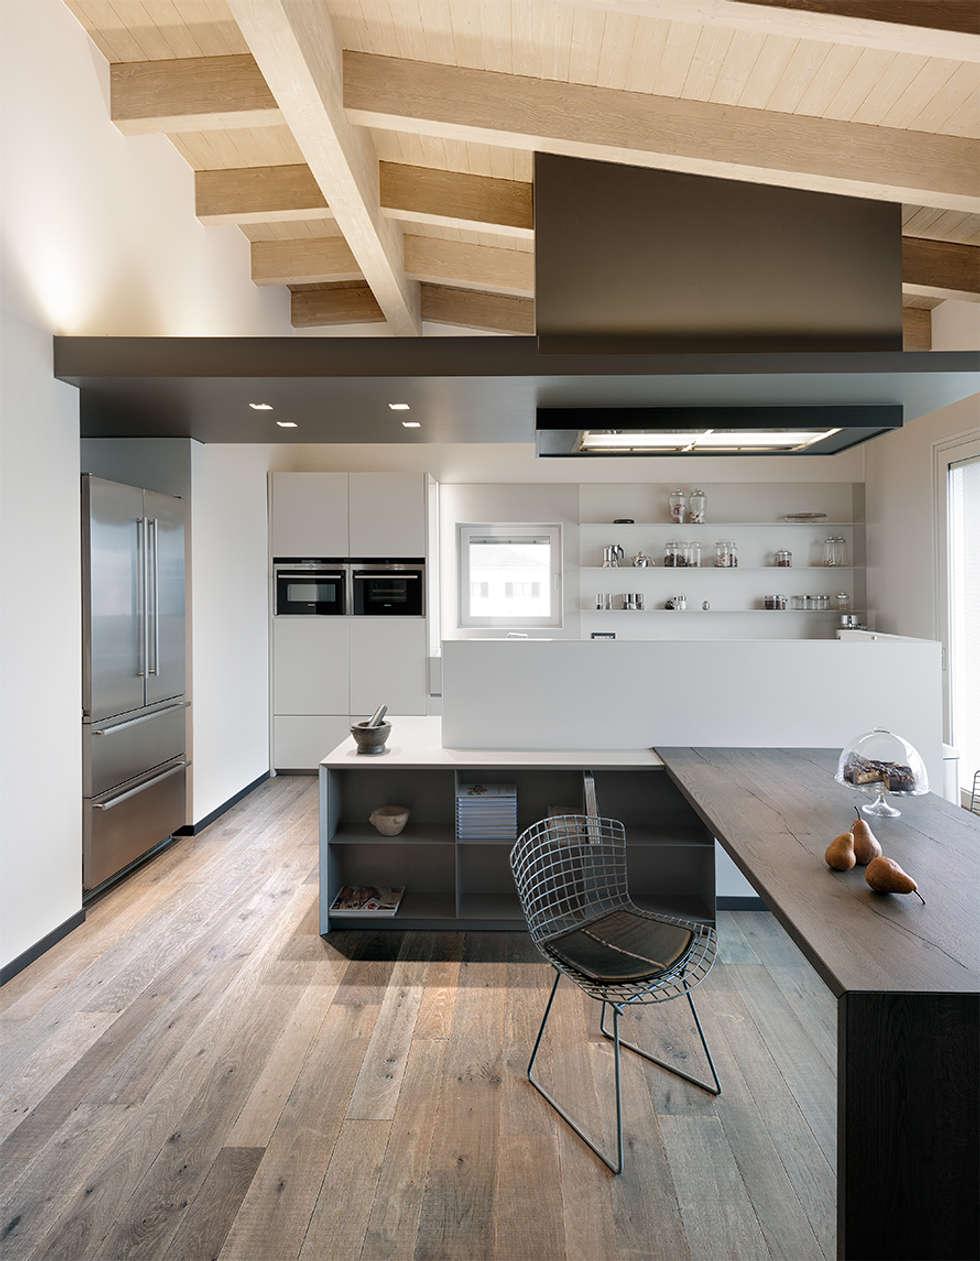 Cucine moderne lineari lusso in88 pineglen - Cucine da sogno ...